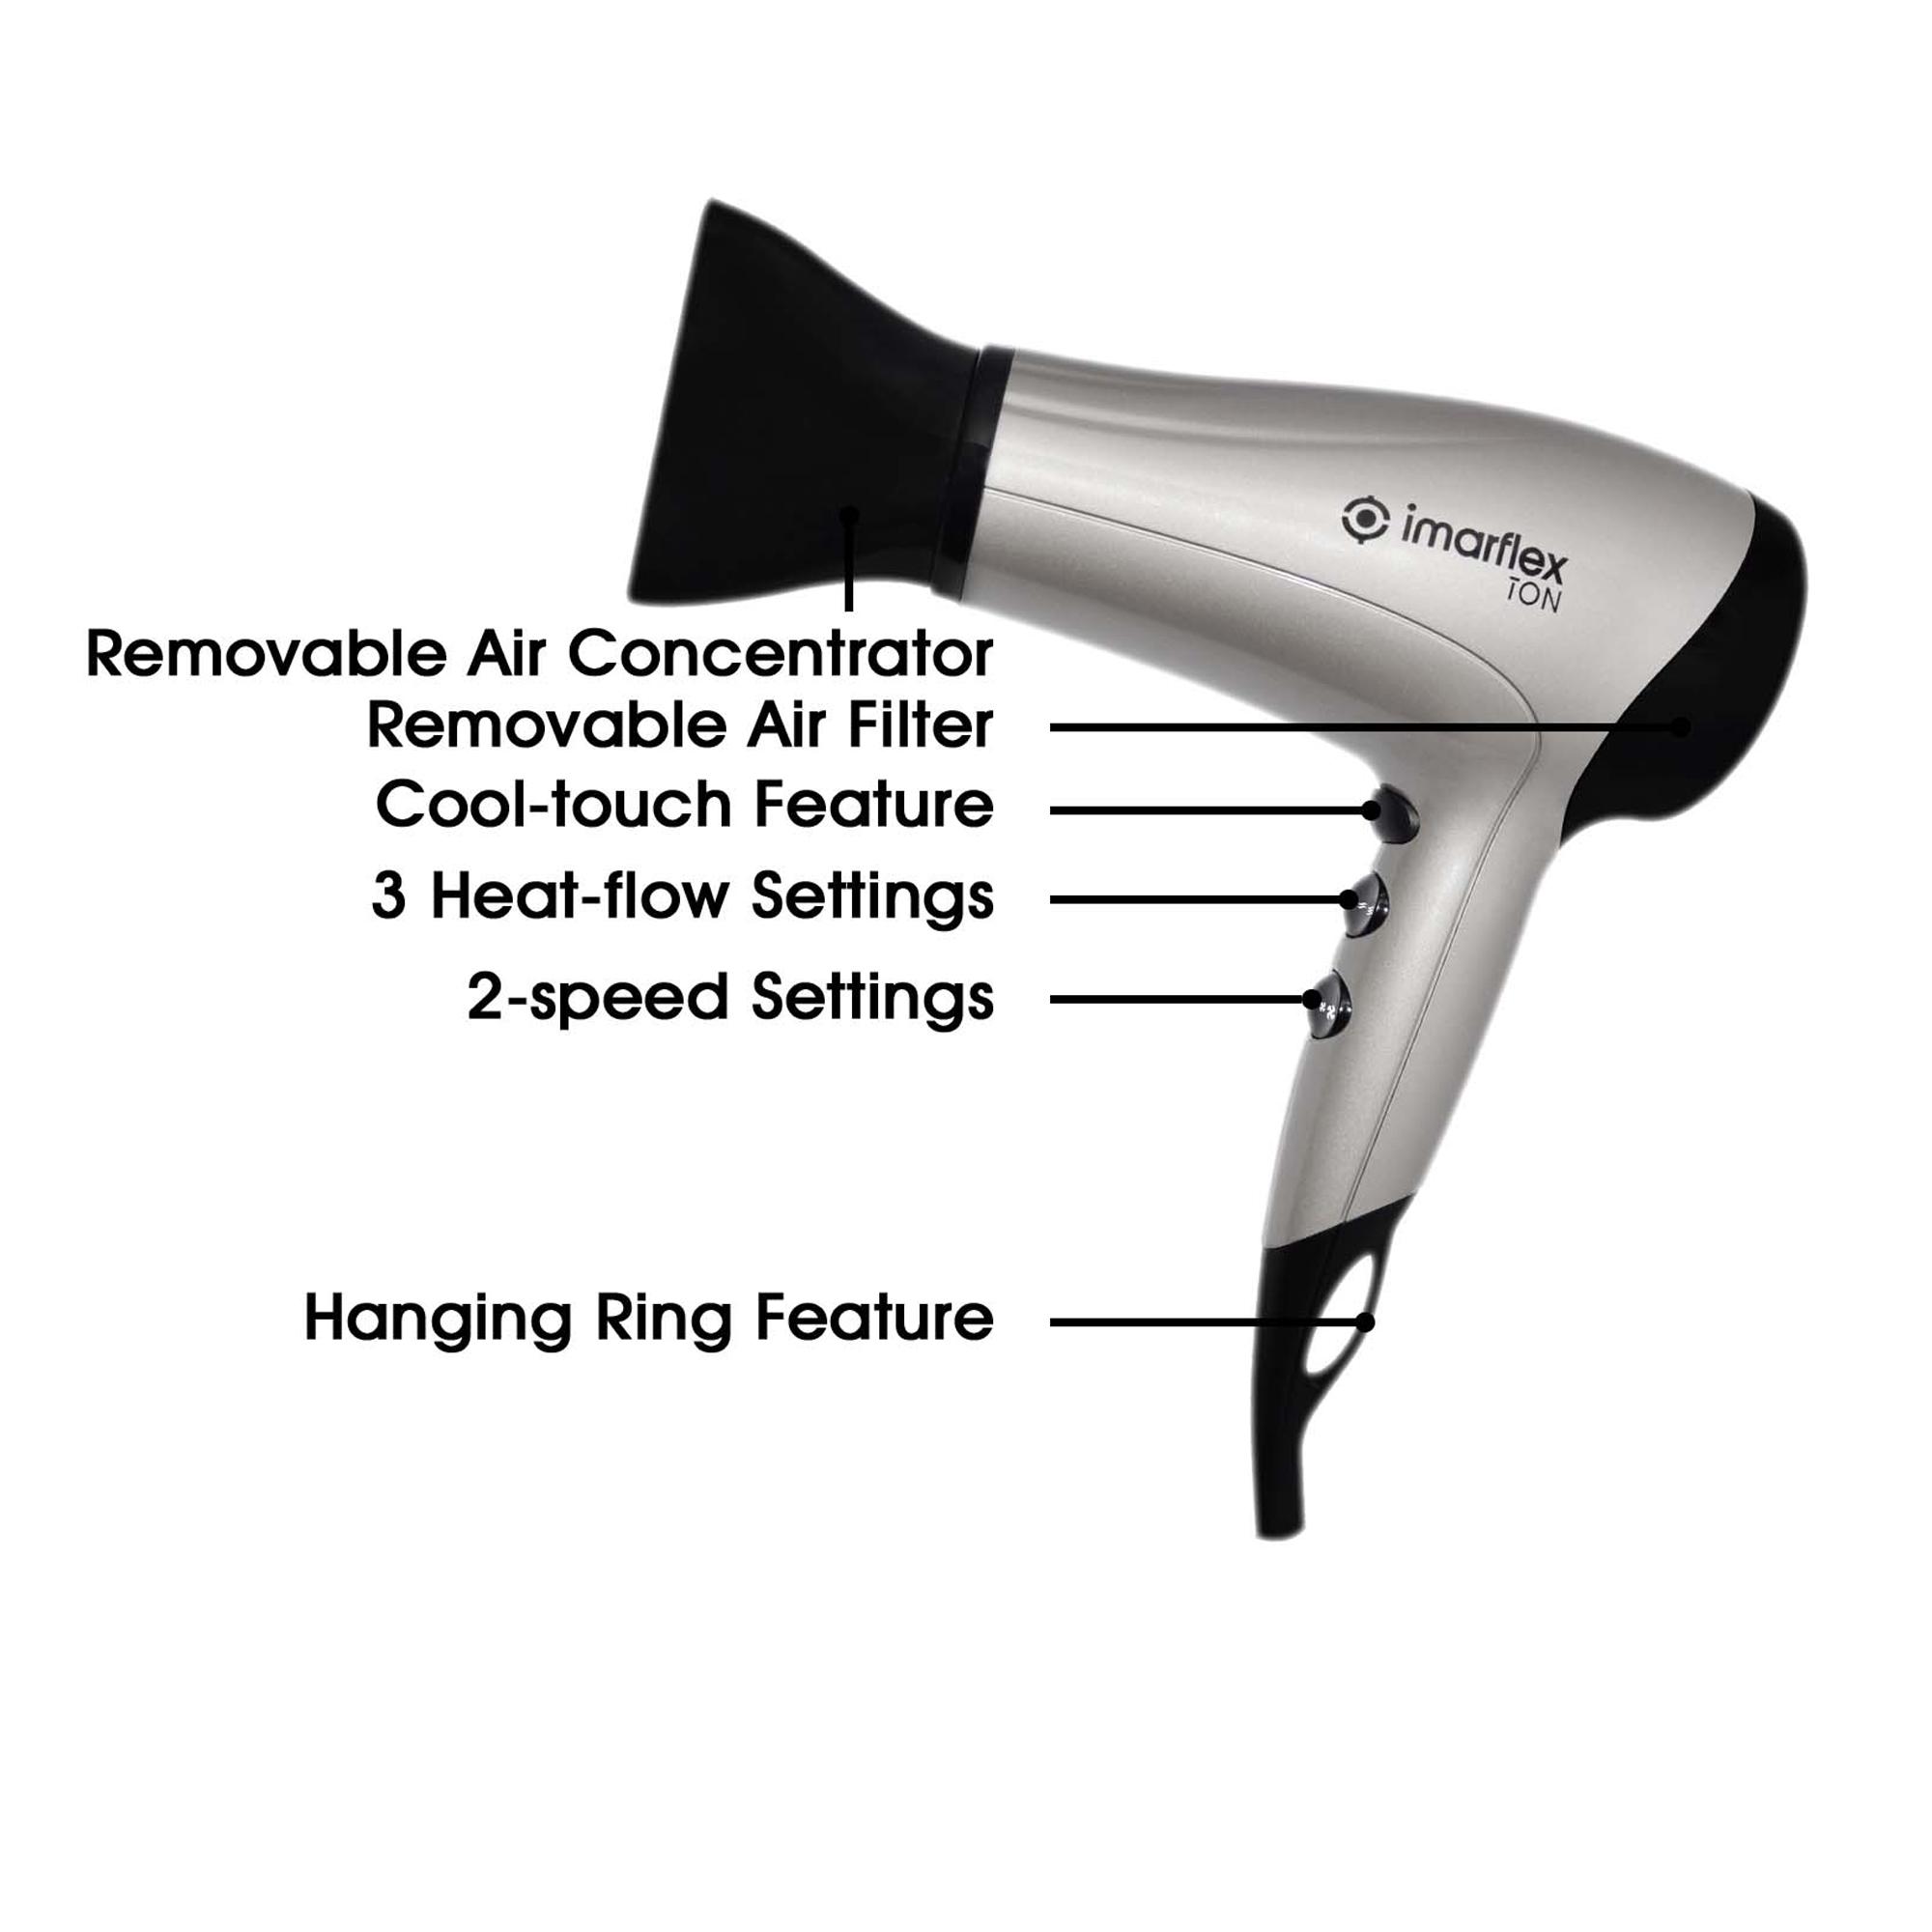 Imarflex HD 2210C Hair Dryer IONIC